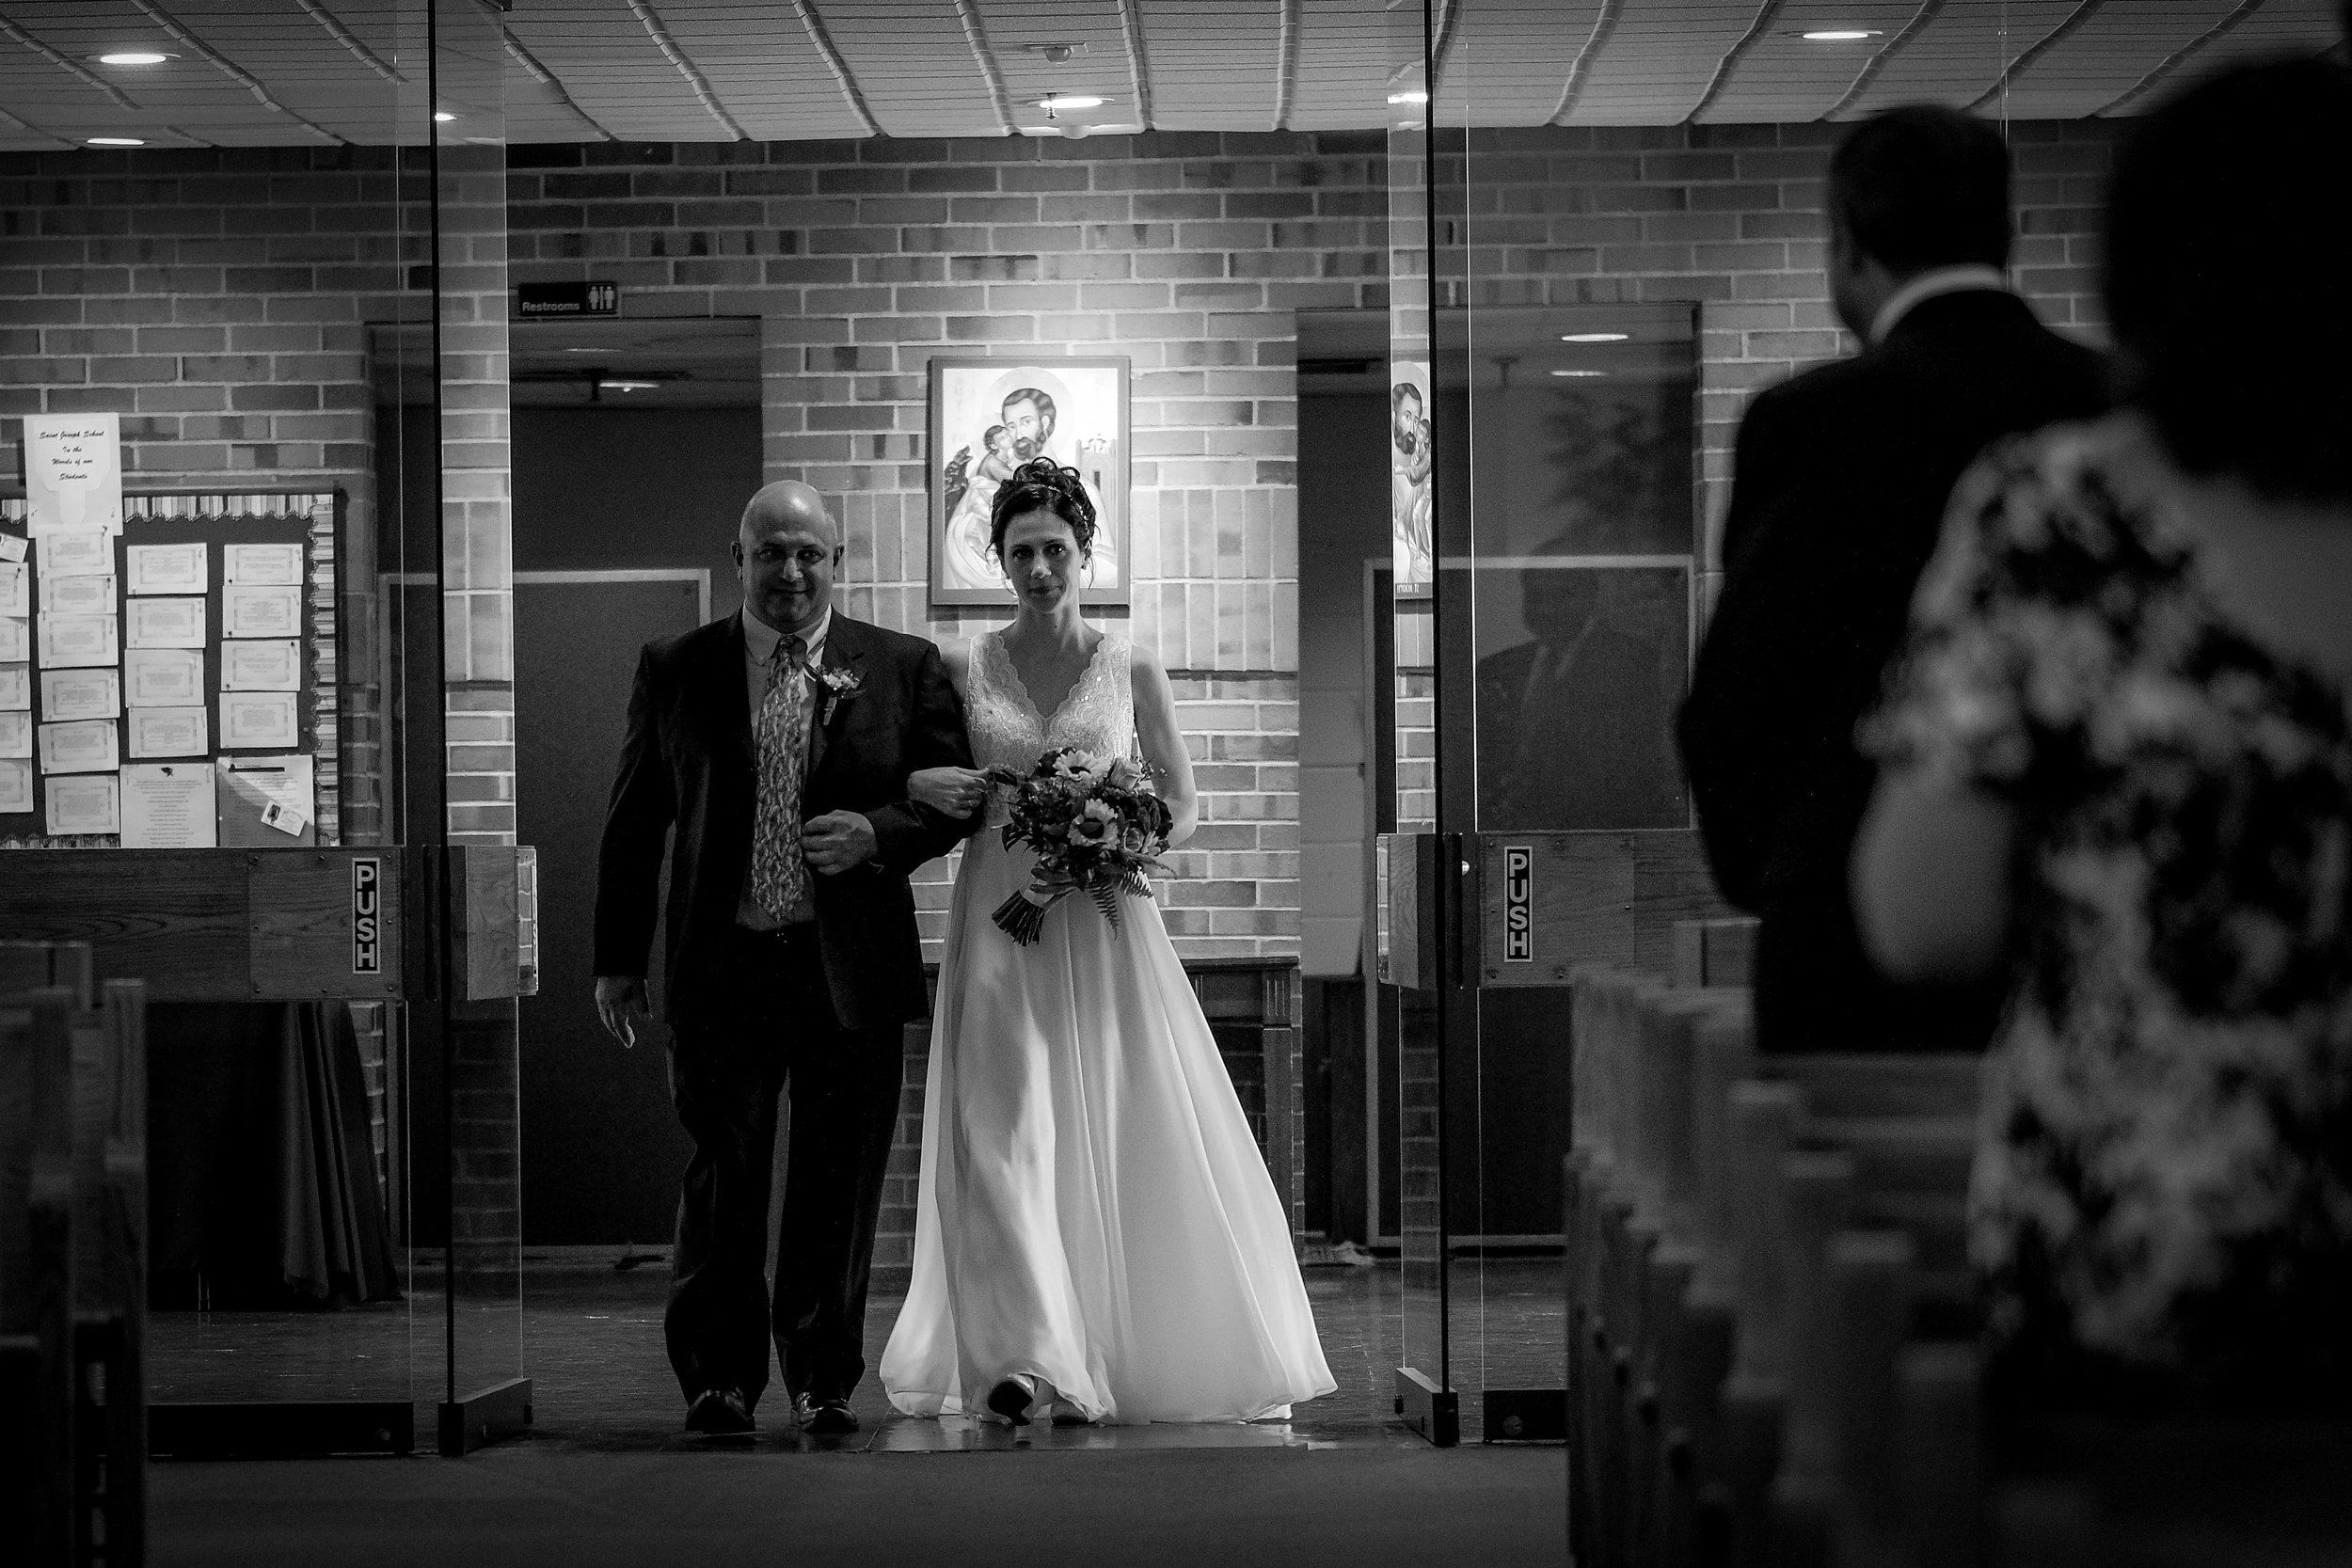 Peabody-Smith-Barn-Wedding-Photography-5.jpg